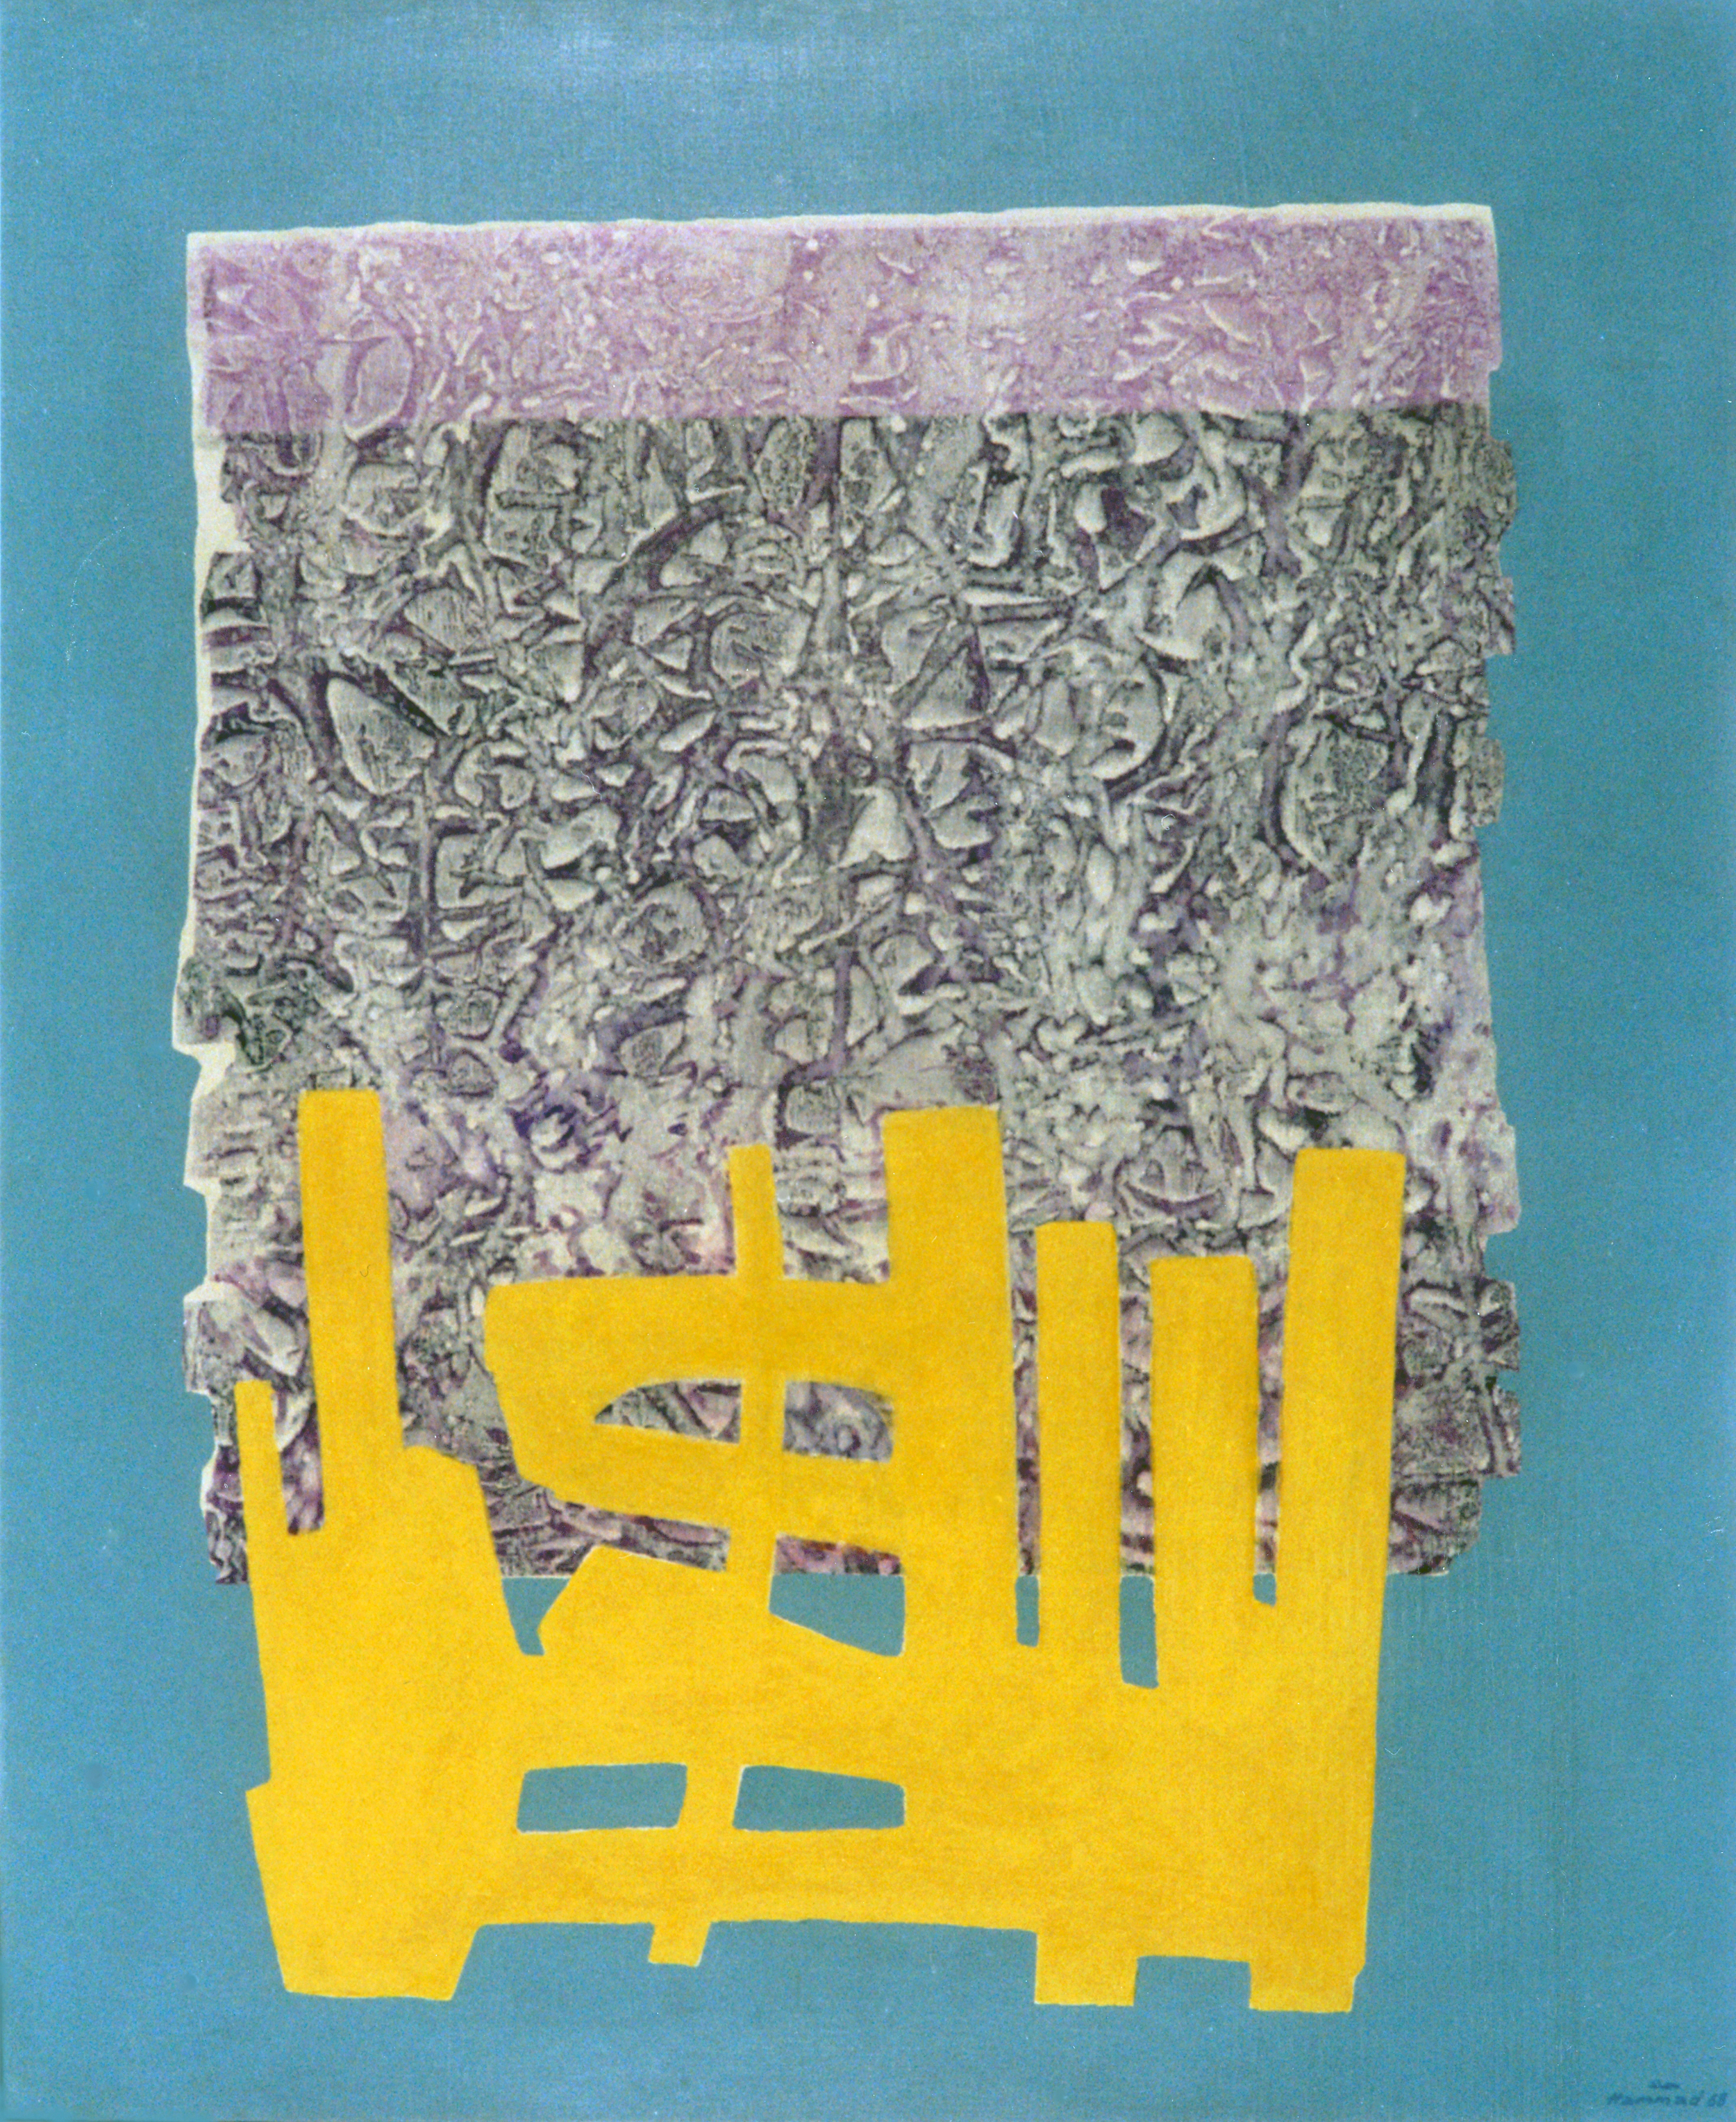 Calligraphy . 1968 . كتابة عربية